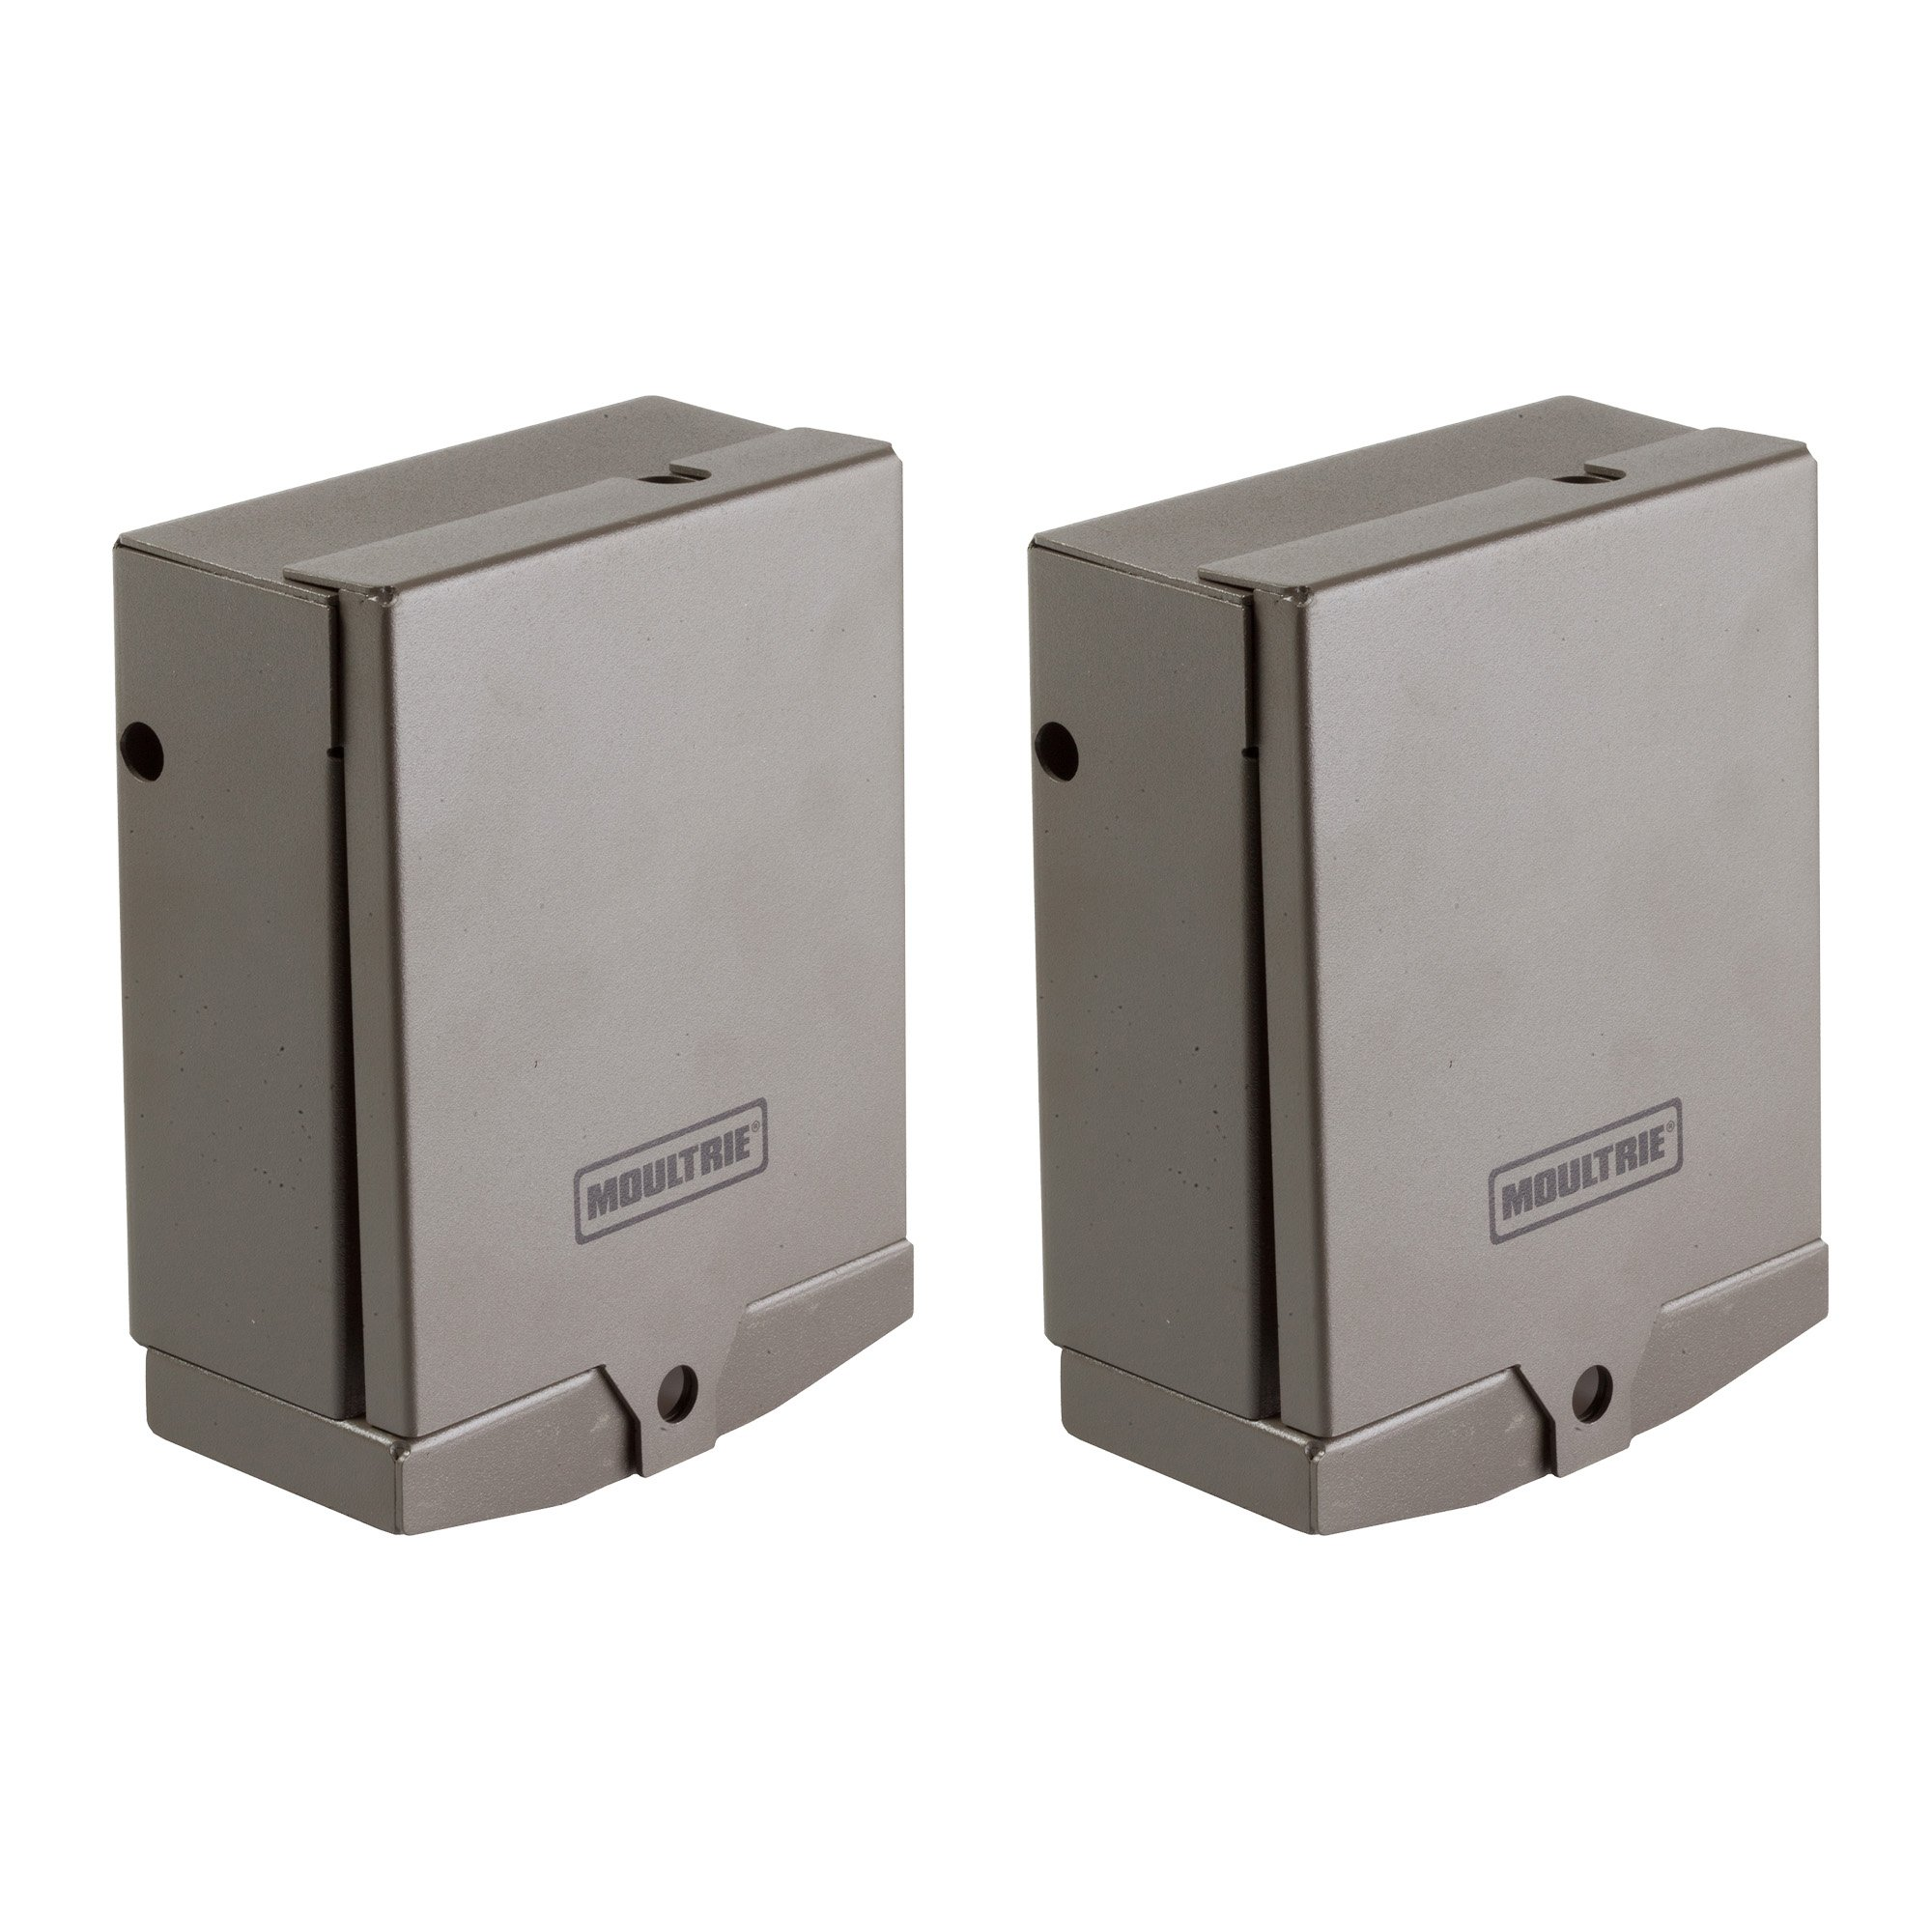 Moultrie Mobile 16-Gauge Steel MV1 Field Modem Security Box, 2 Pack | MCA-13186